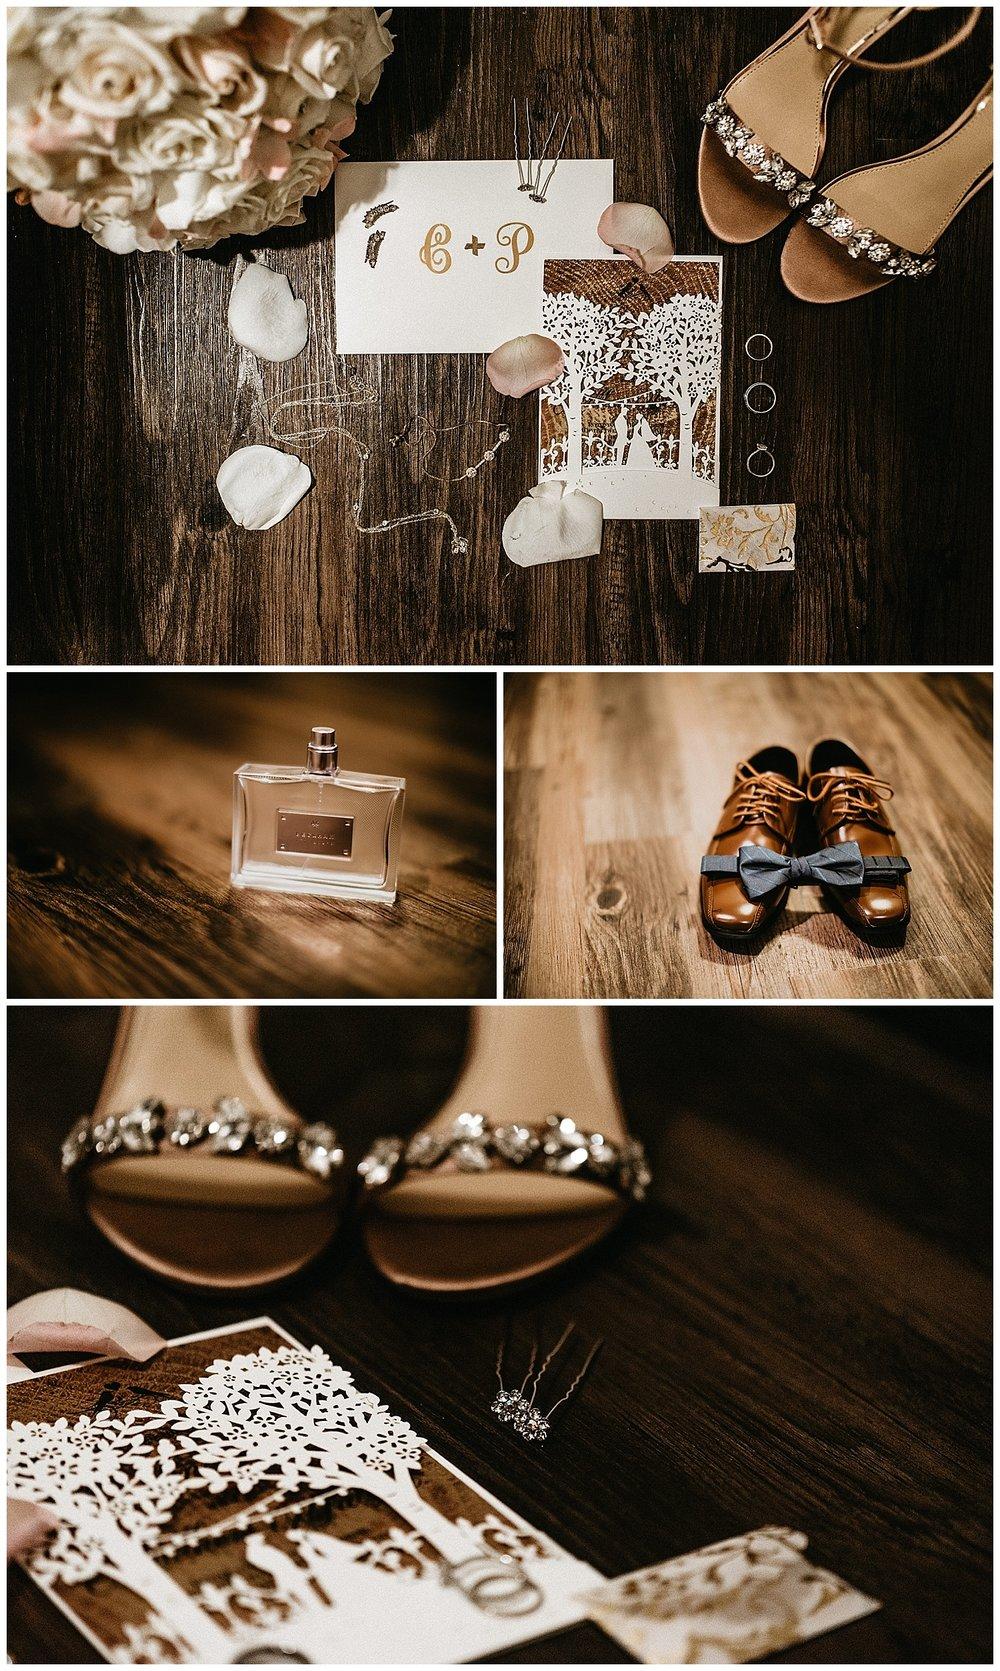 New-Jersey-wedding-photographer-at-Stone-House-at-stirling-ridge-Warren-NJ_0027.jpg